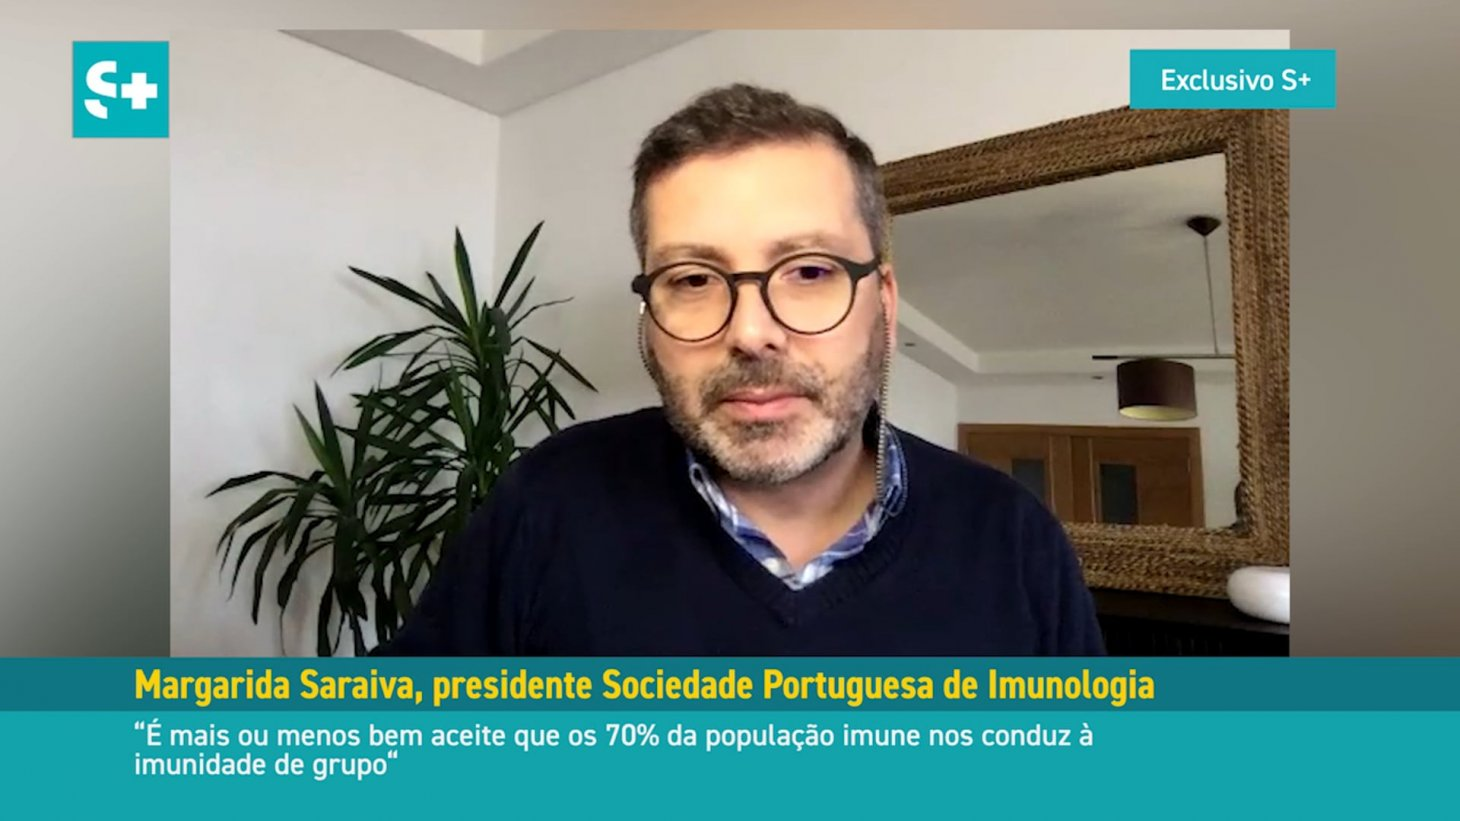 Margarida Saraiva, presidente Sociedade Portuguesa de Imunologia #01